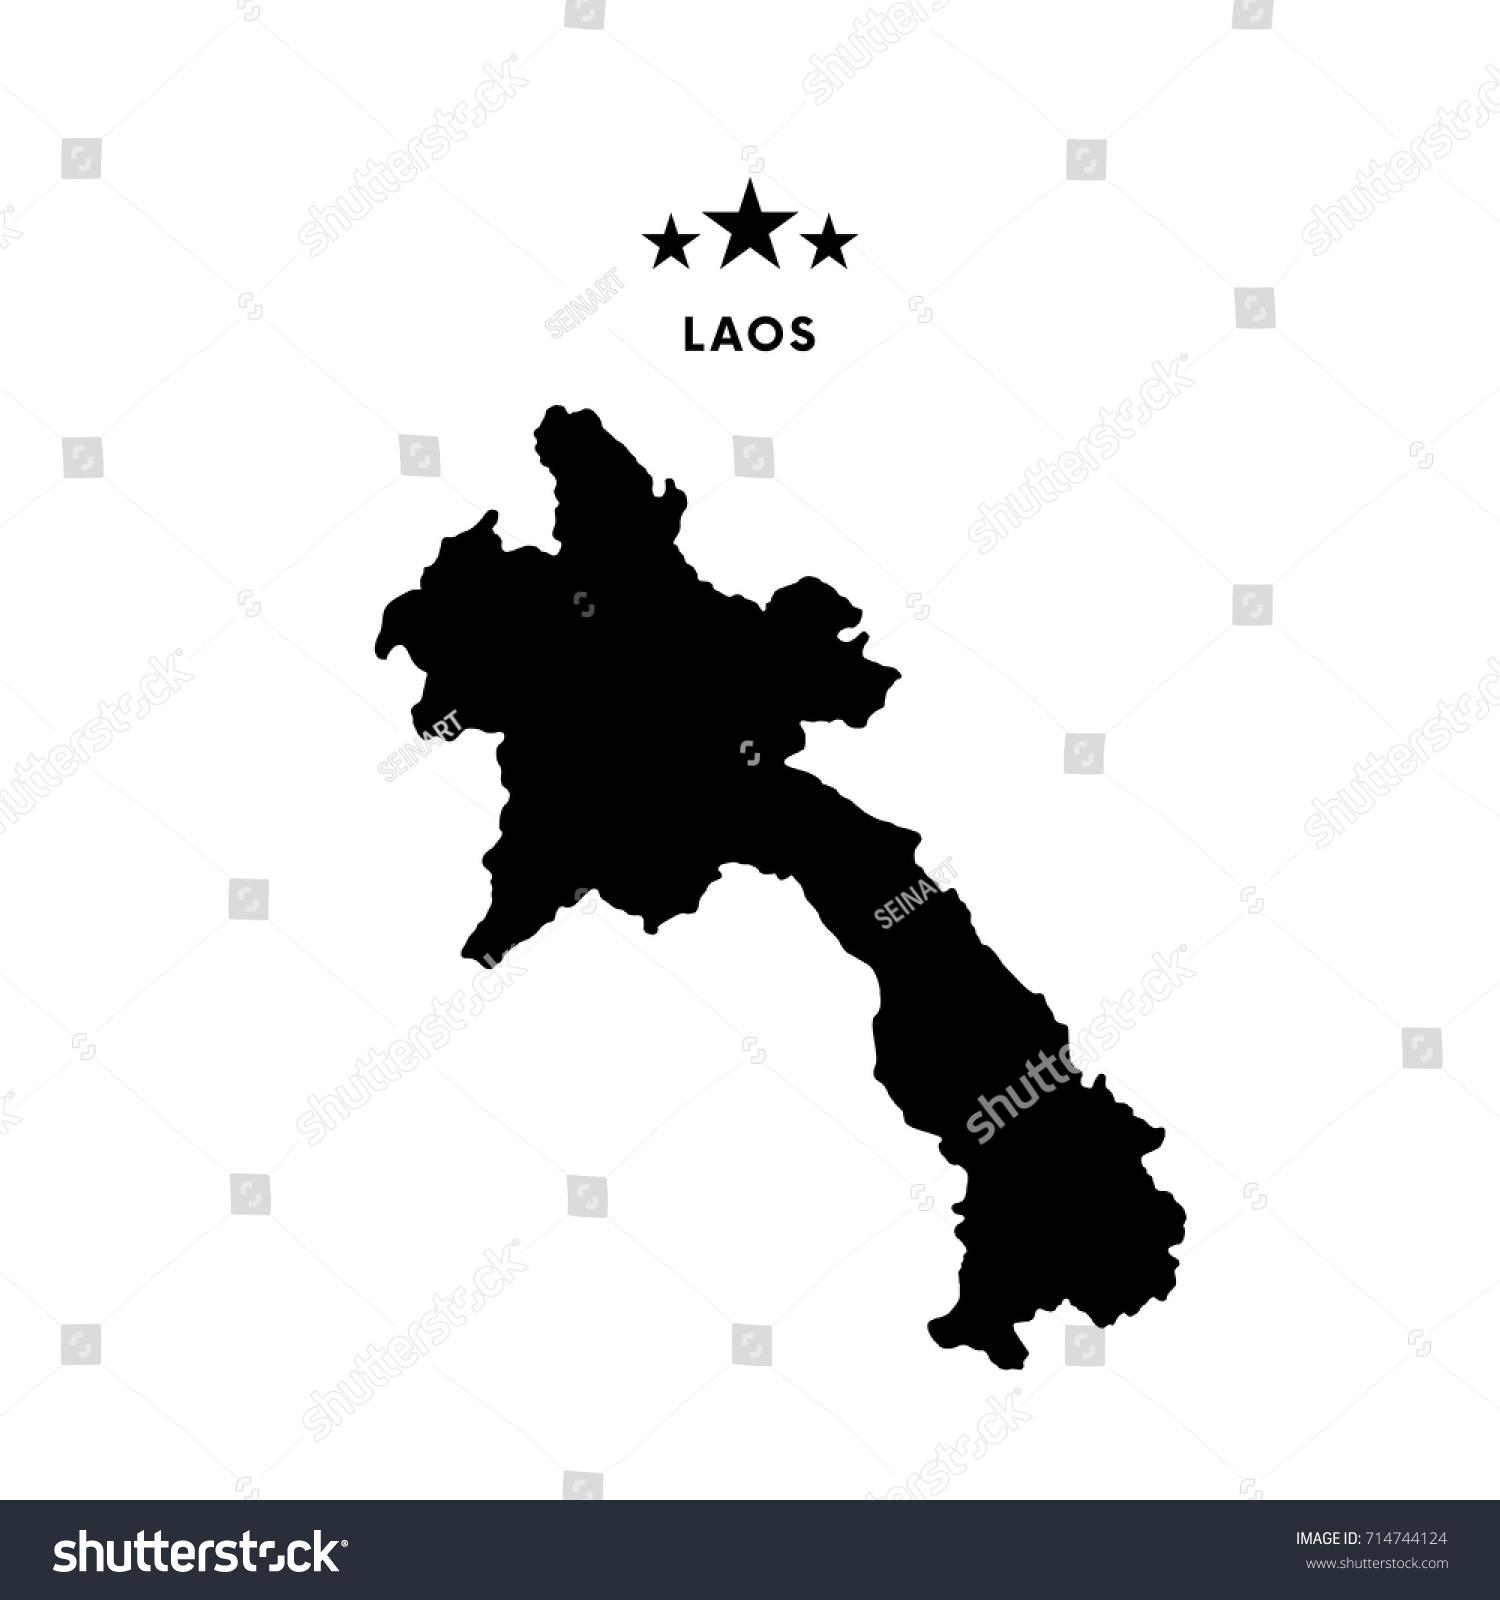 Laos Map Vector Illustration Stock Vector Shutterstock - Laos map vector